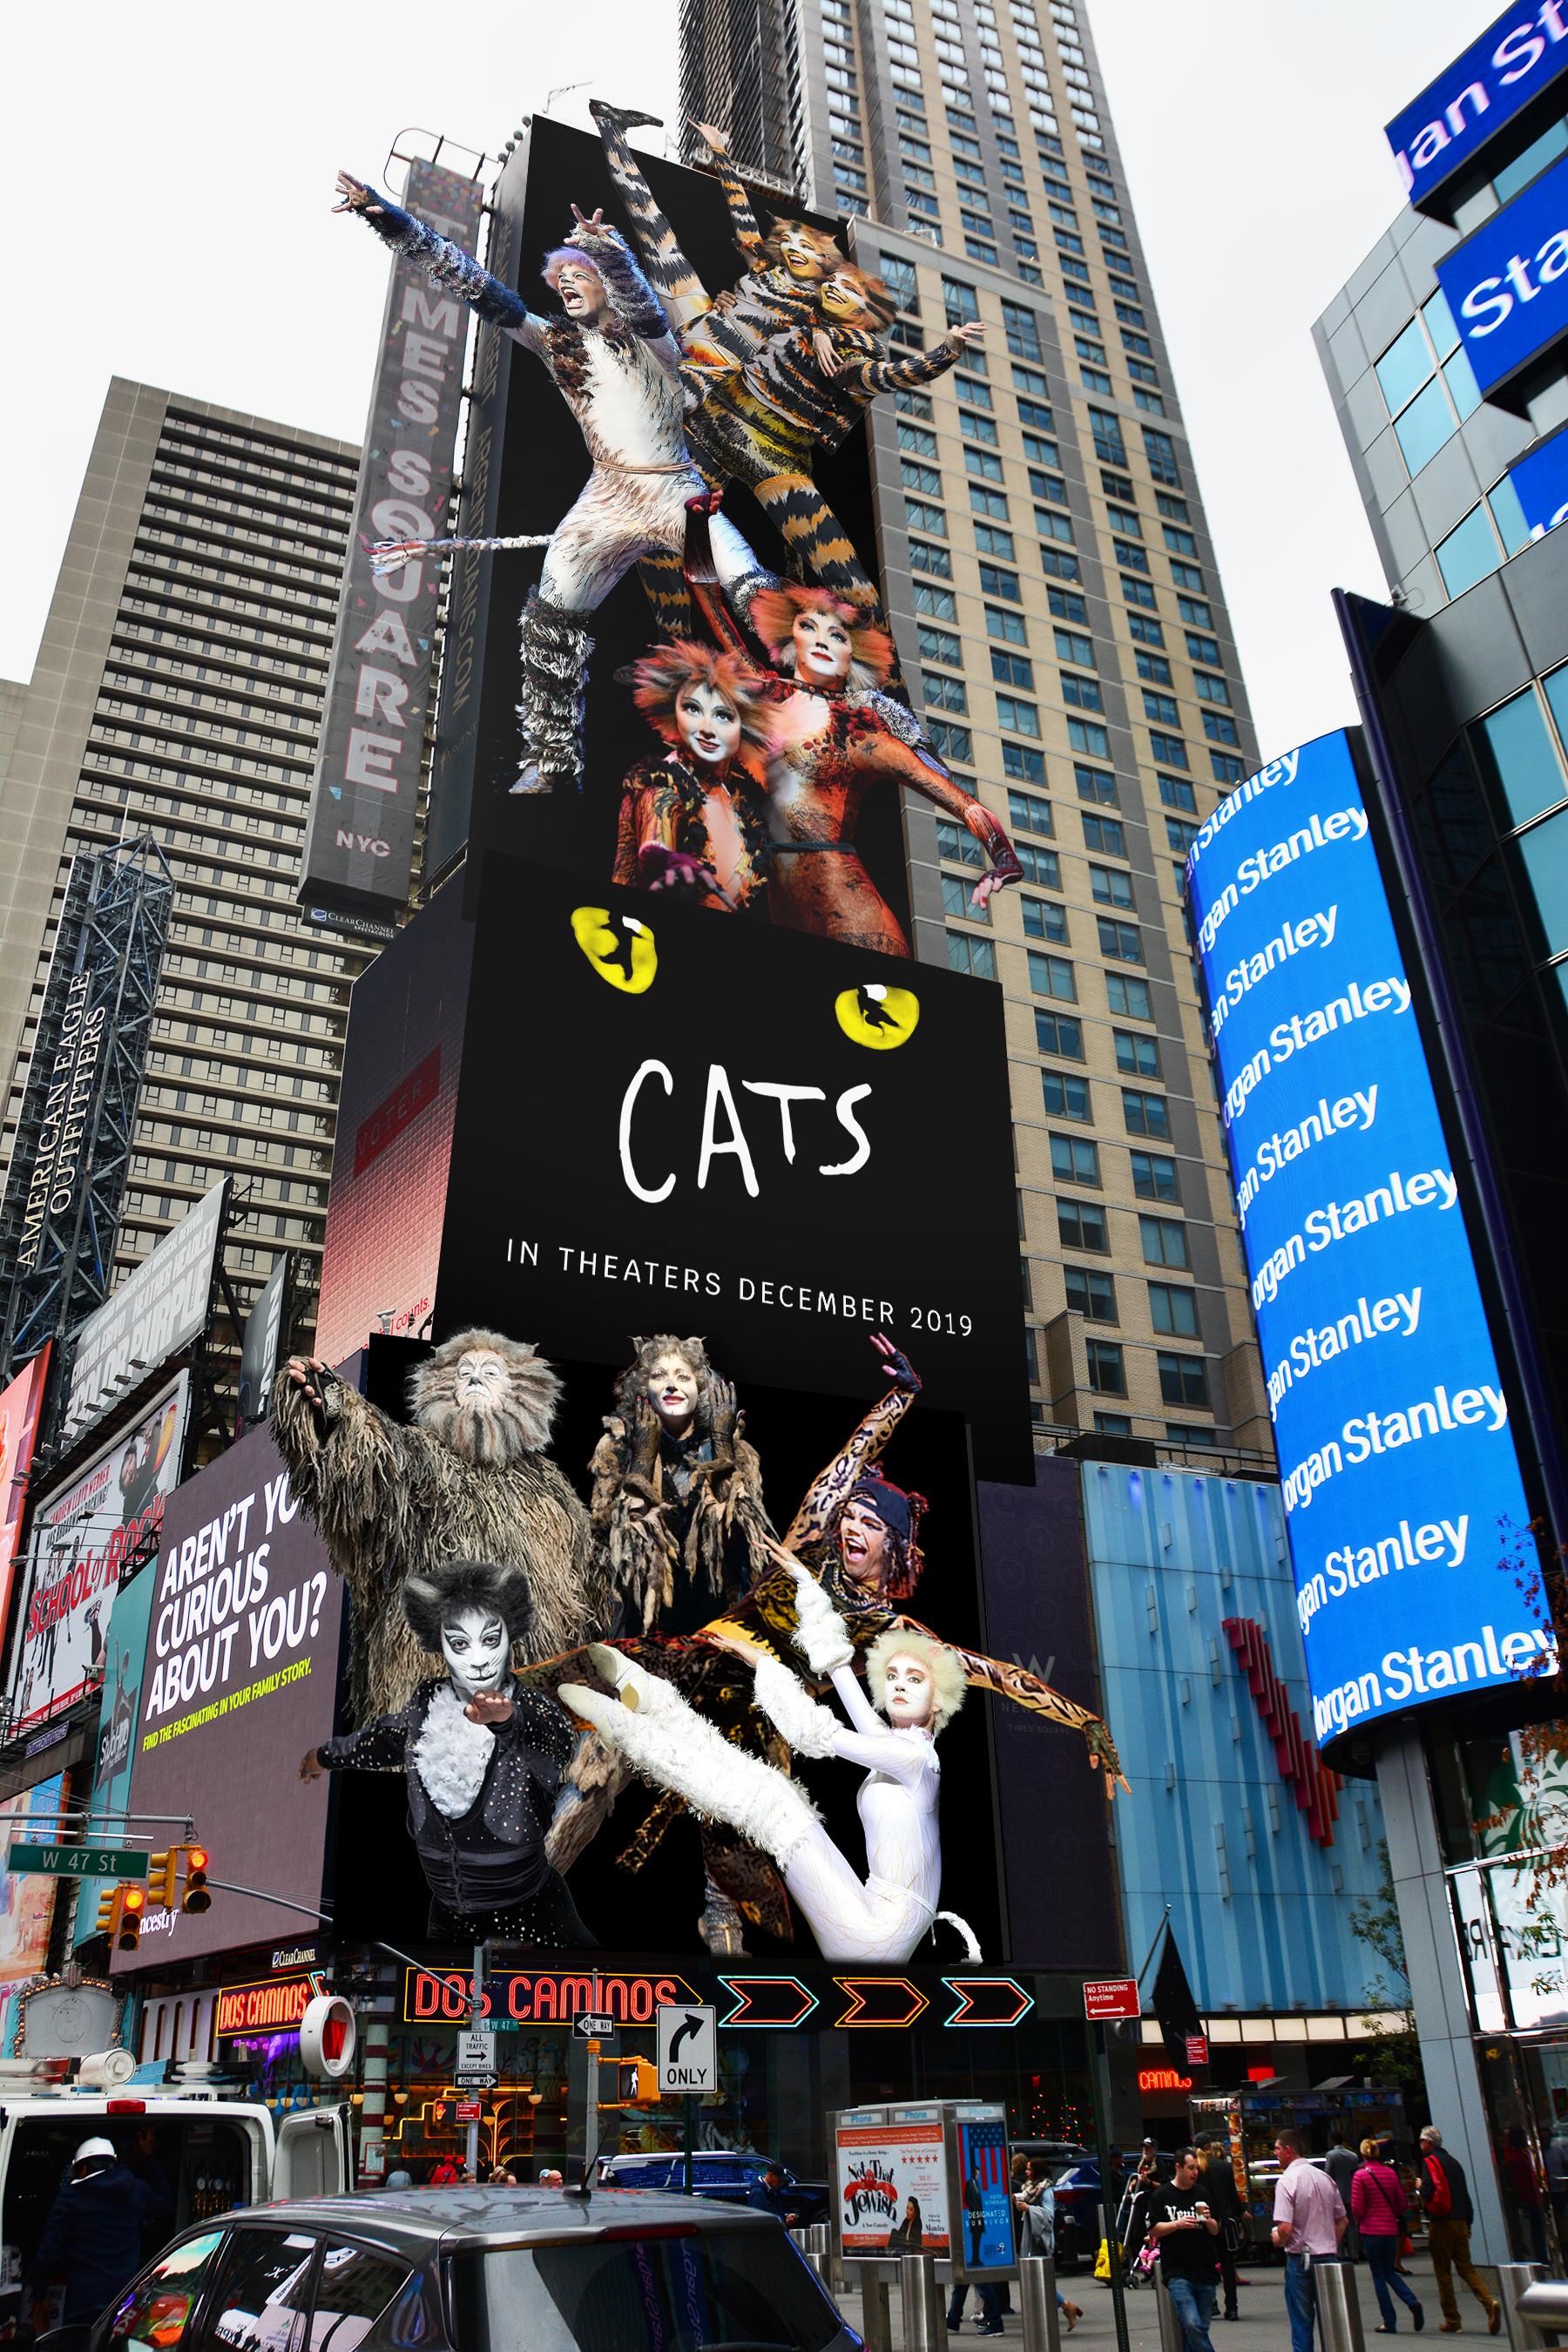 CCO_Cats_Universal_144-135-136_day.jpg